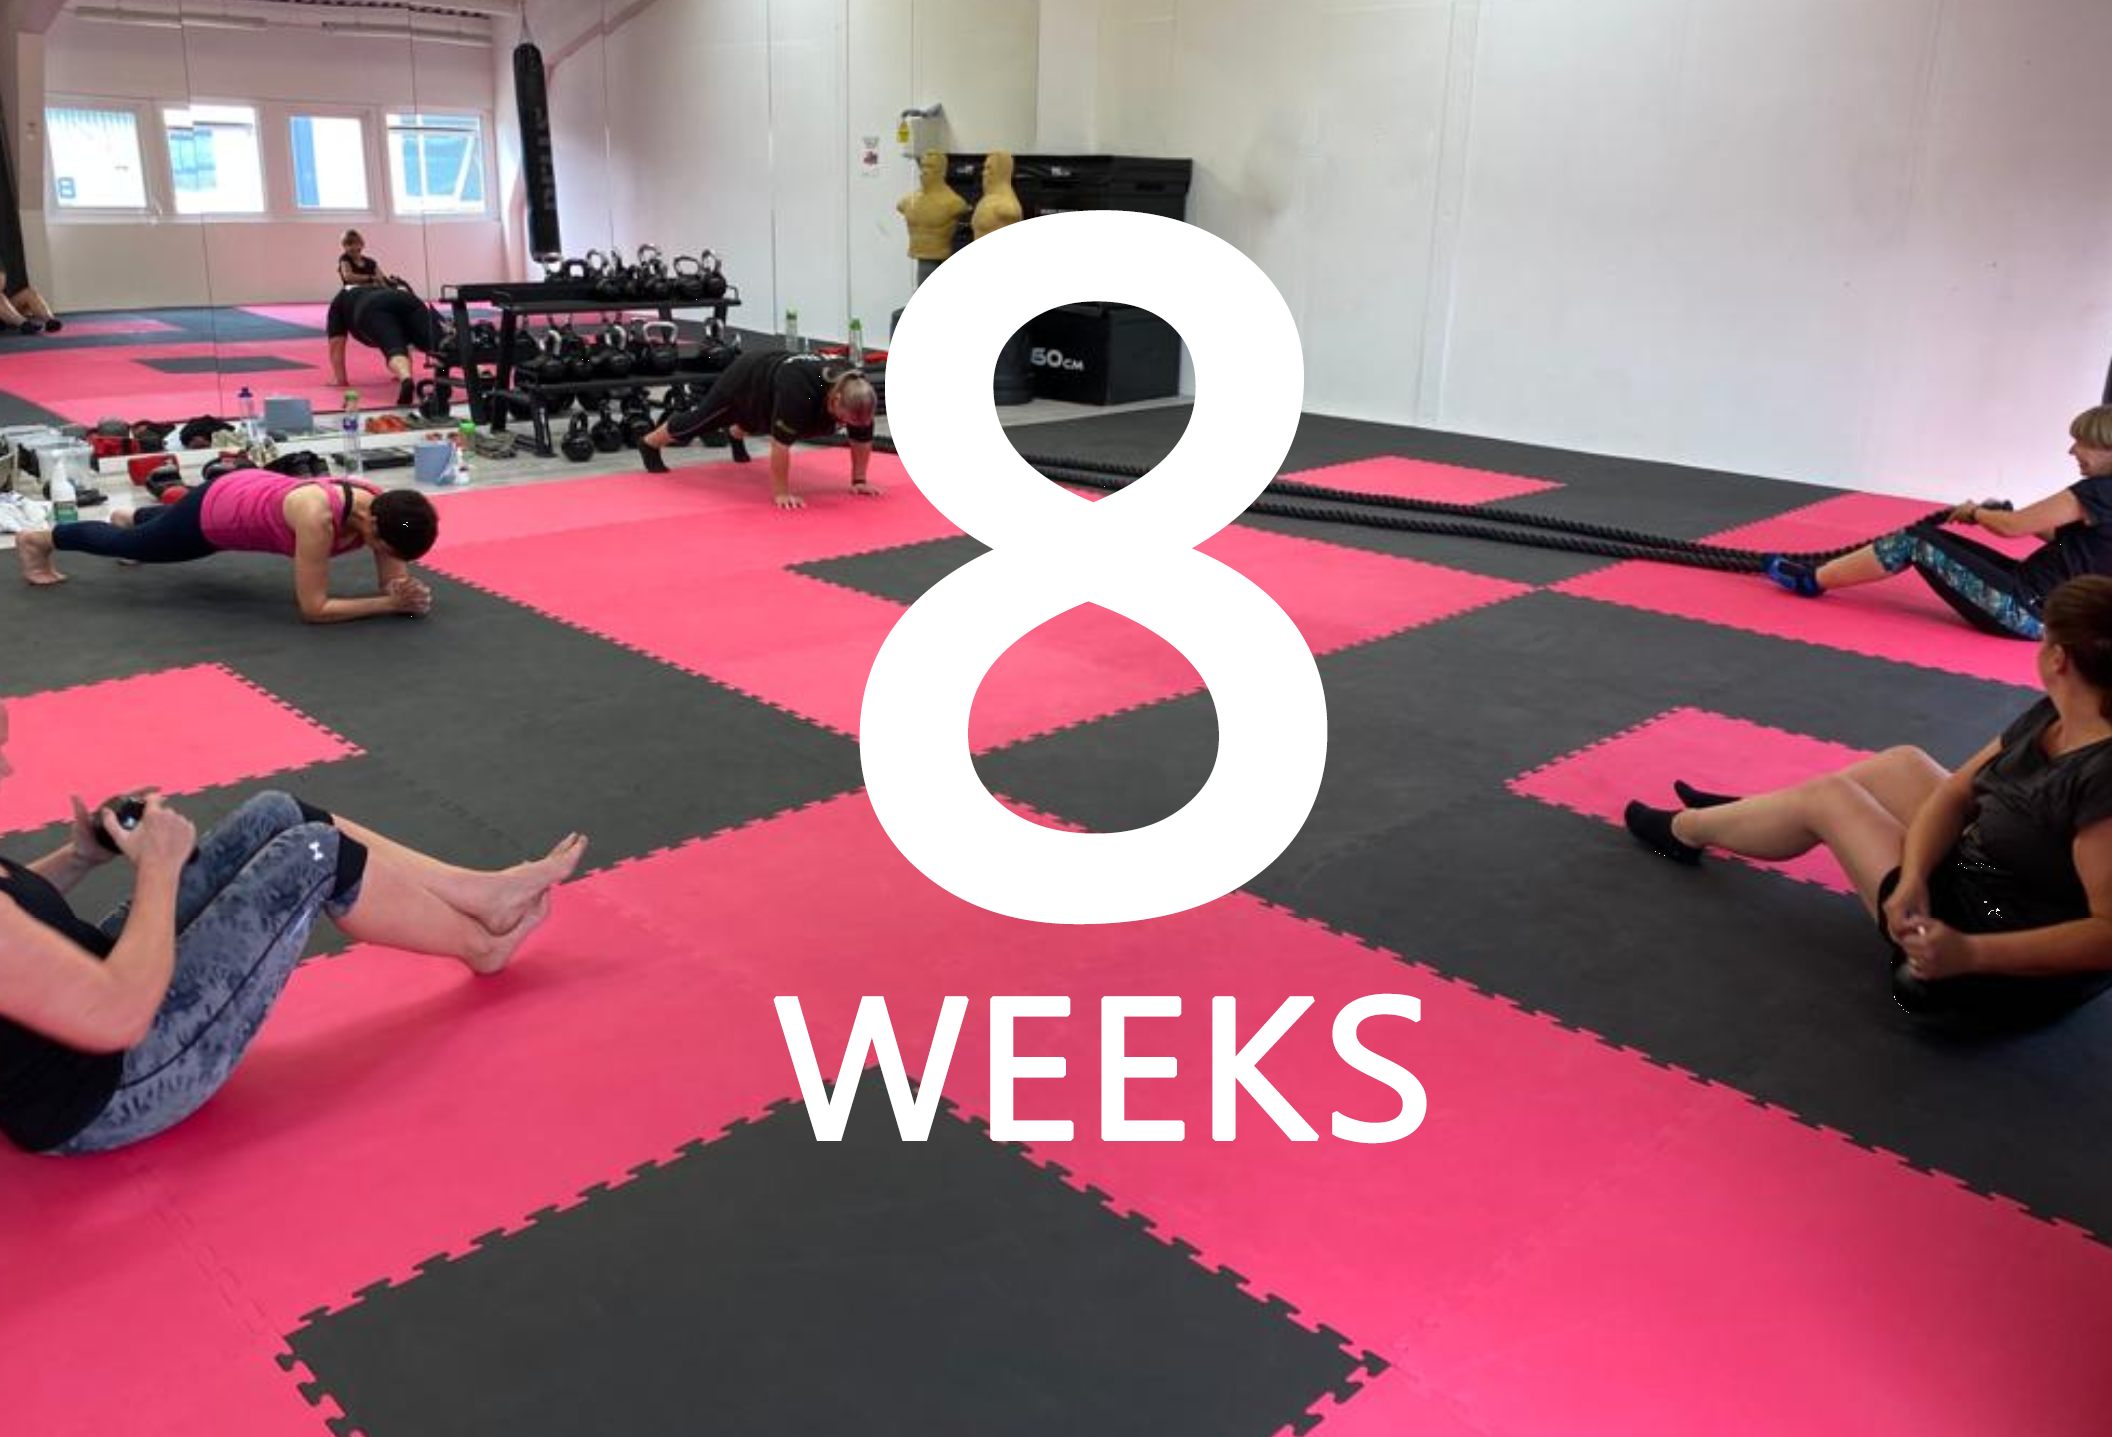 8 Week Exercise Programme